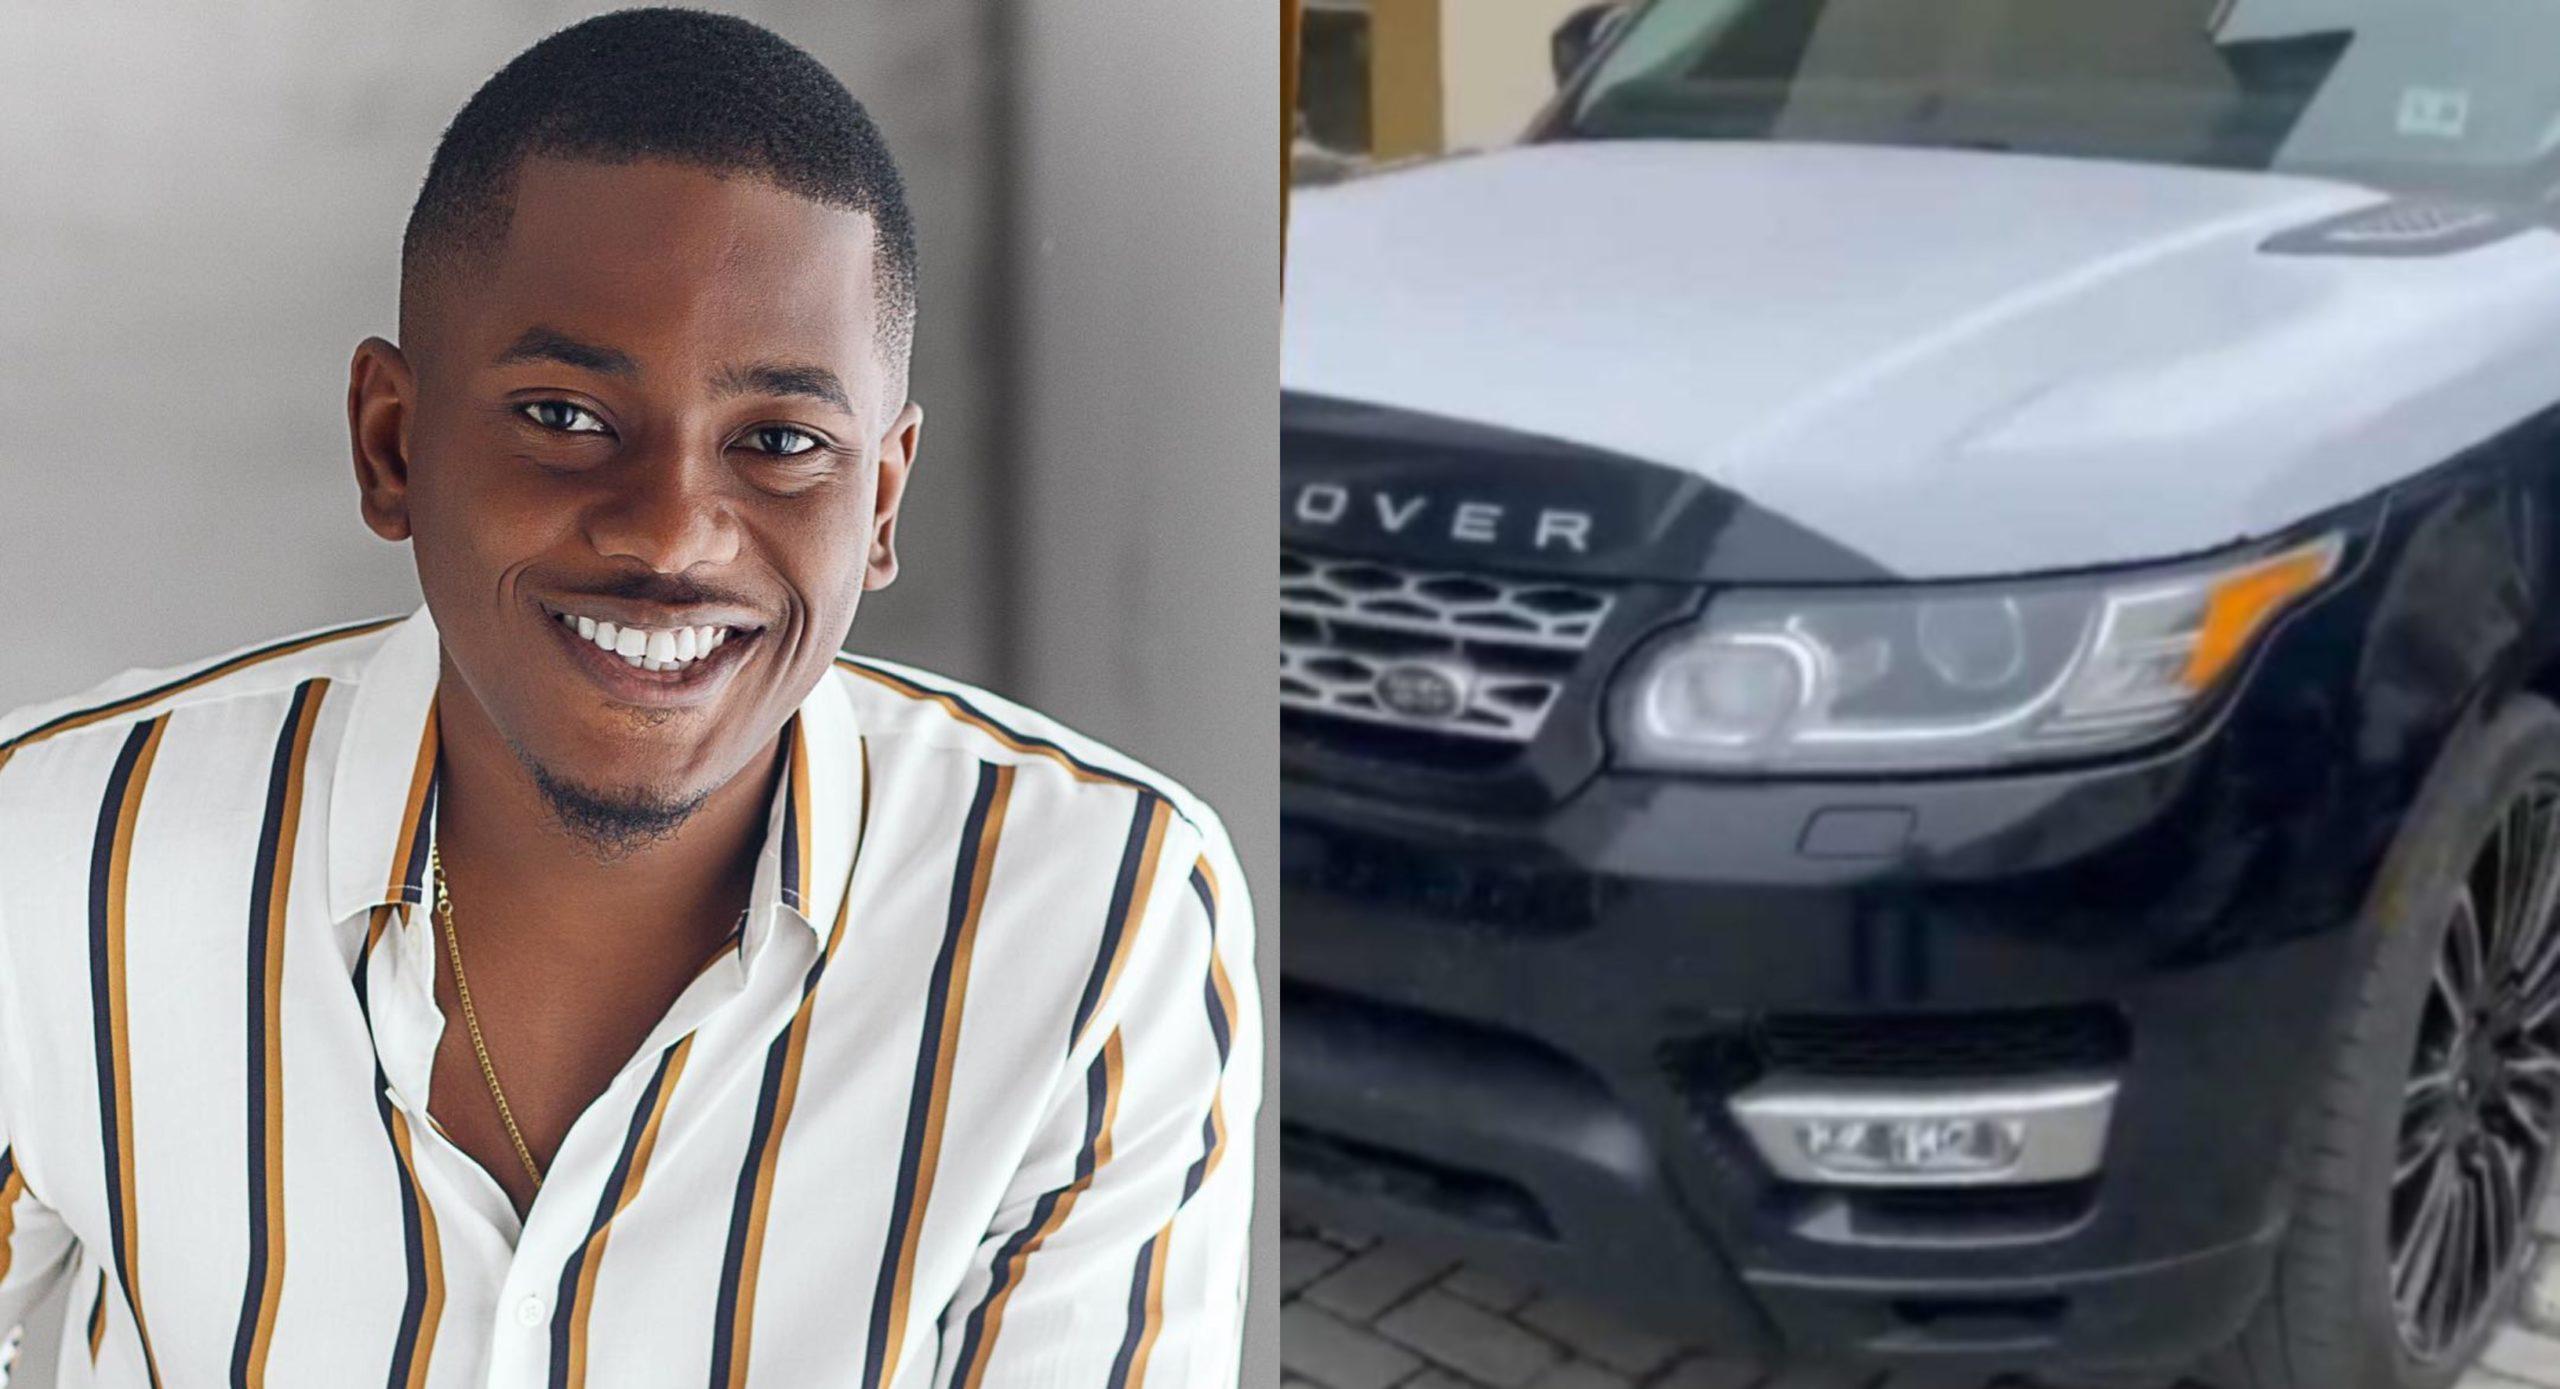 Timini Egbuson acquires Range Rover SUV